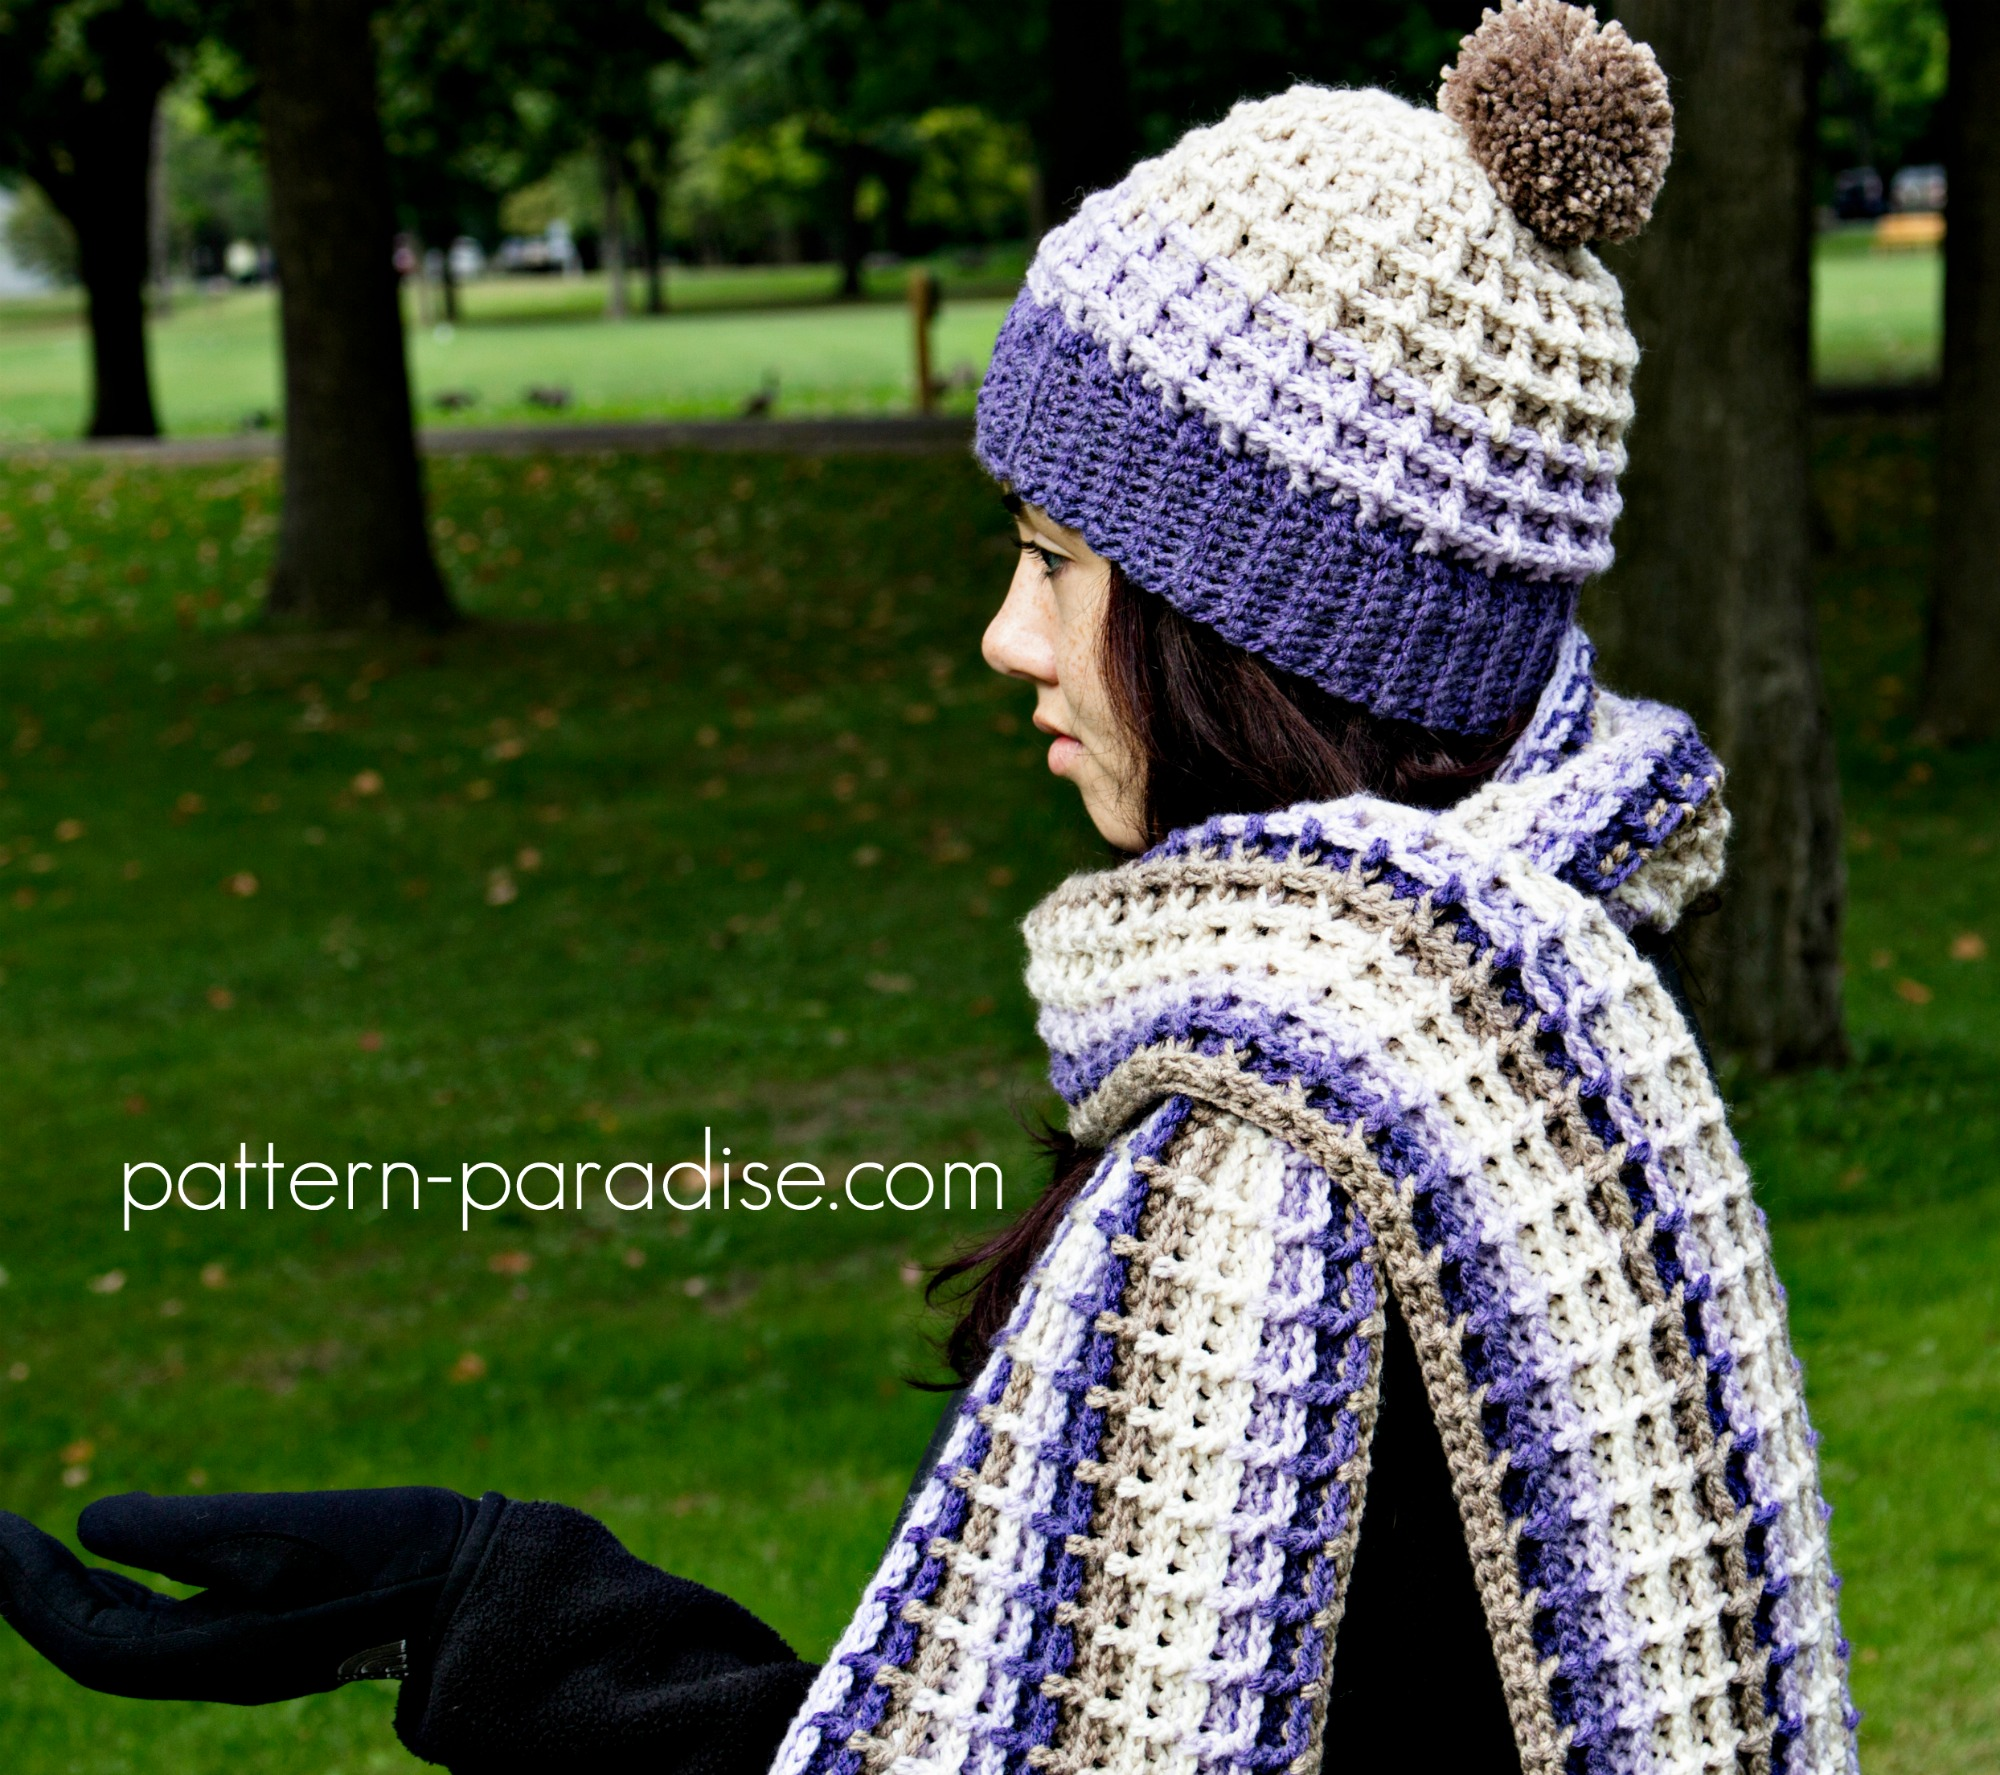 Digital Waffle Stitch Crochet Blanket Pattern Sent Via Email.